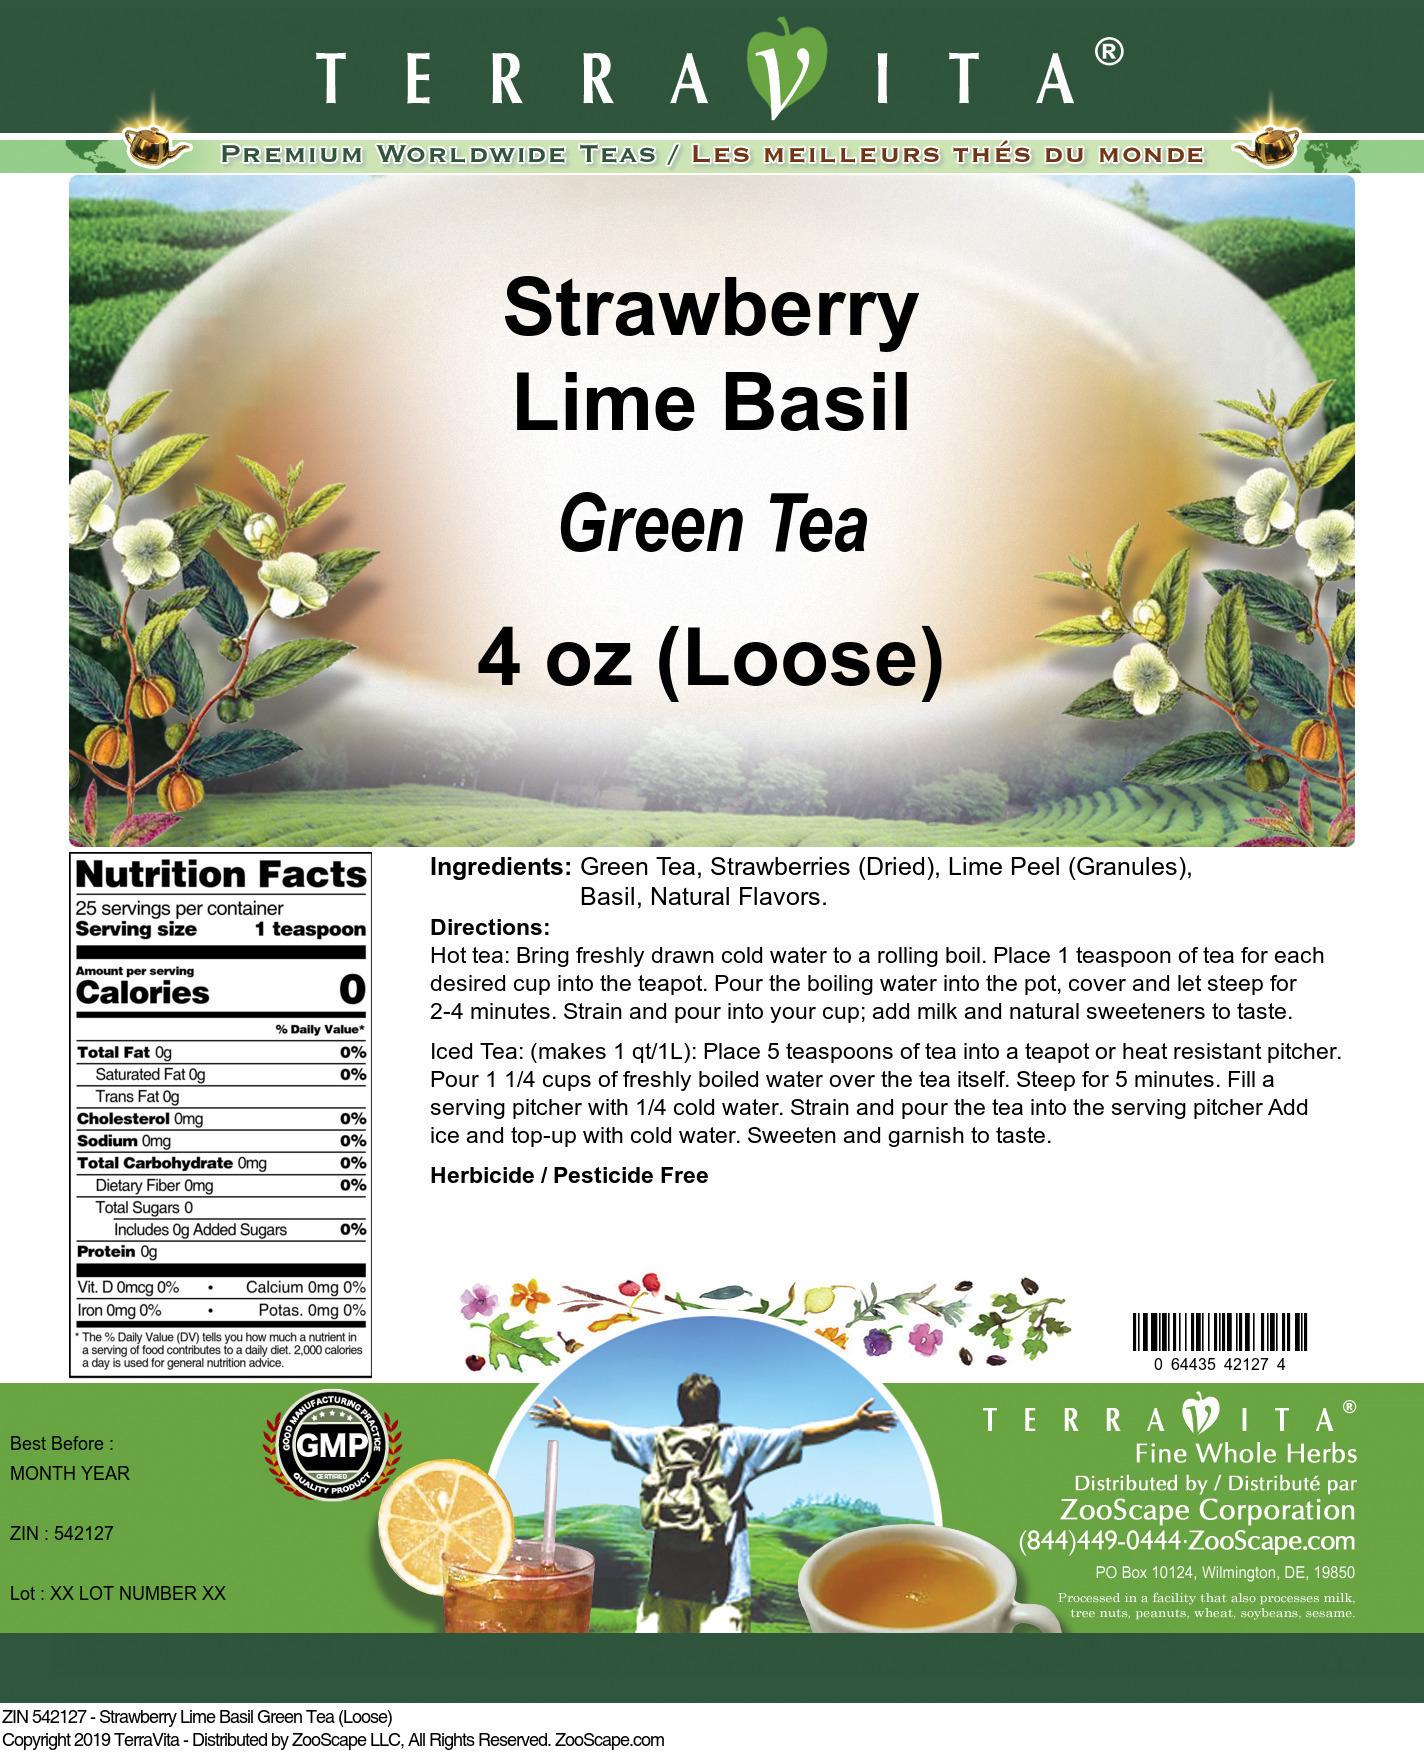 Strawberry Lime Basil Green Tea